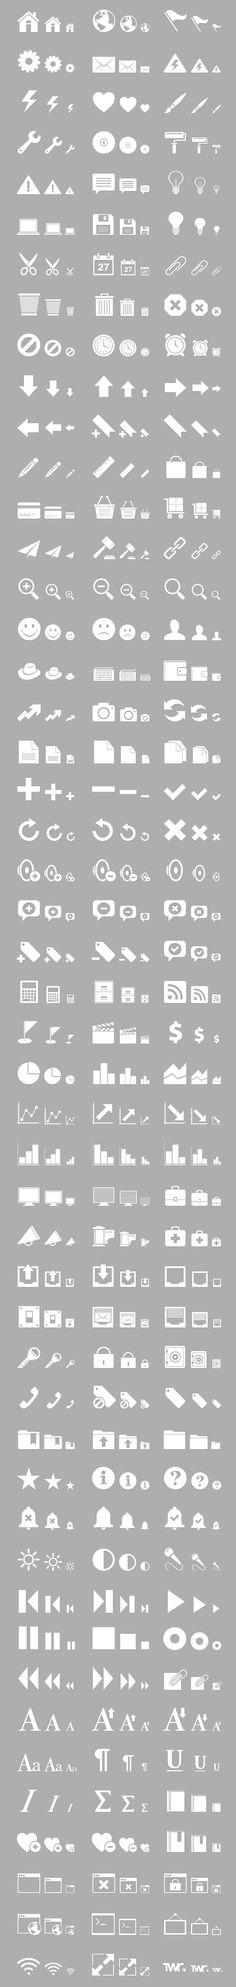 Retina Display Free Icon Set